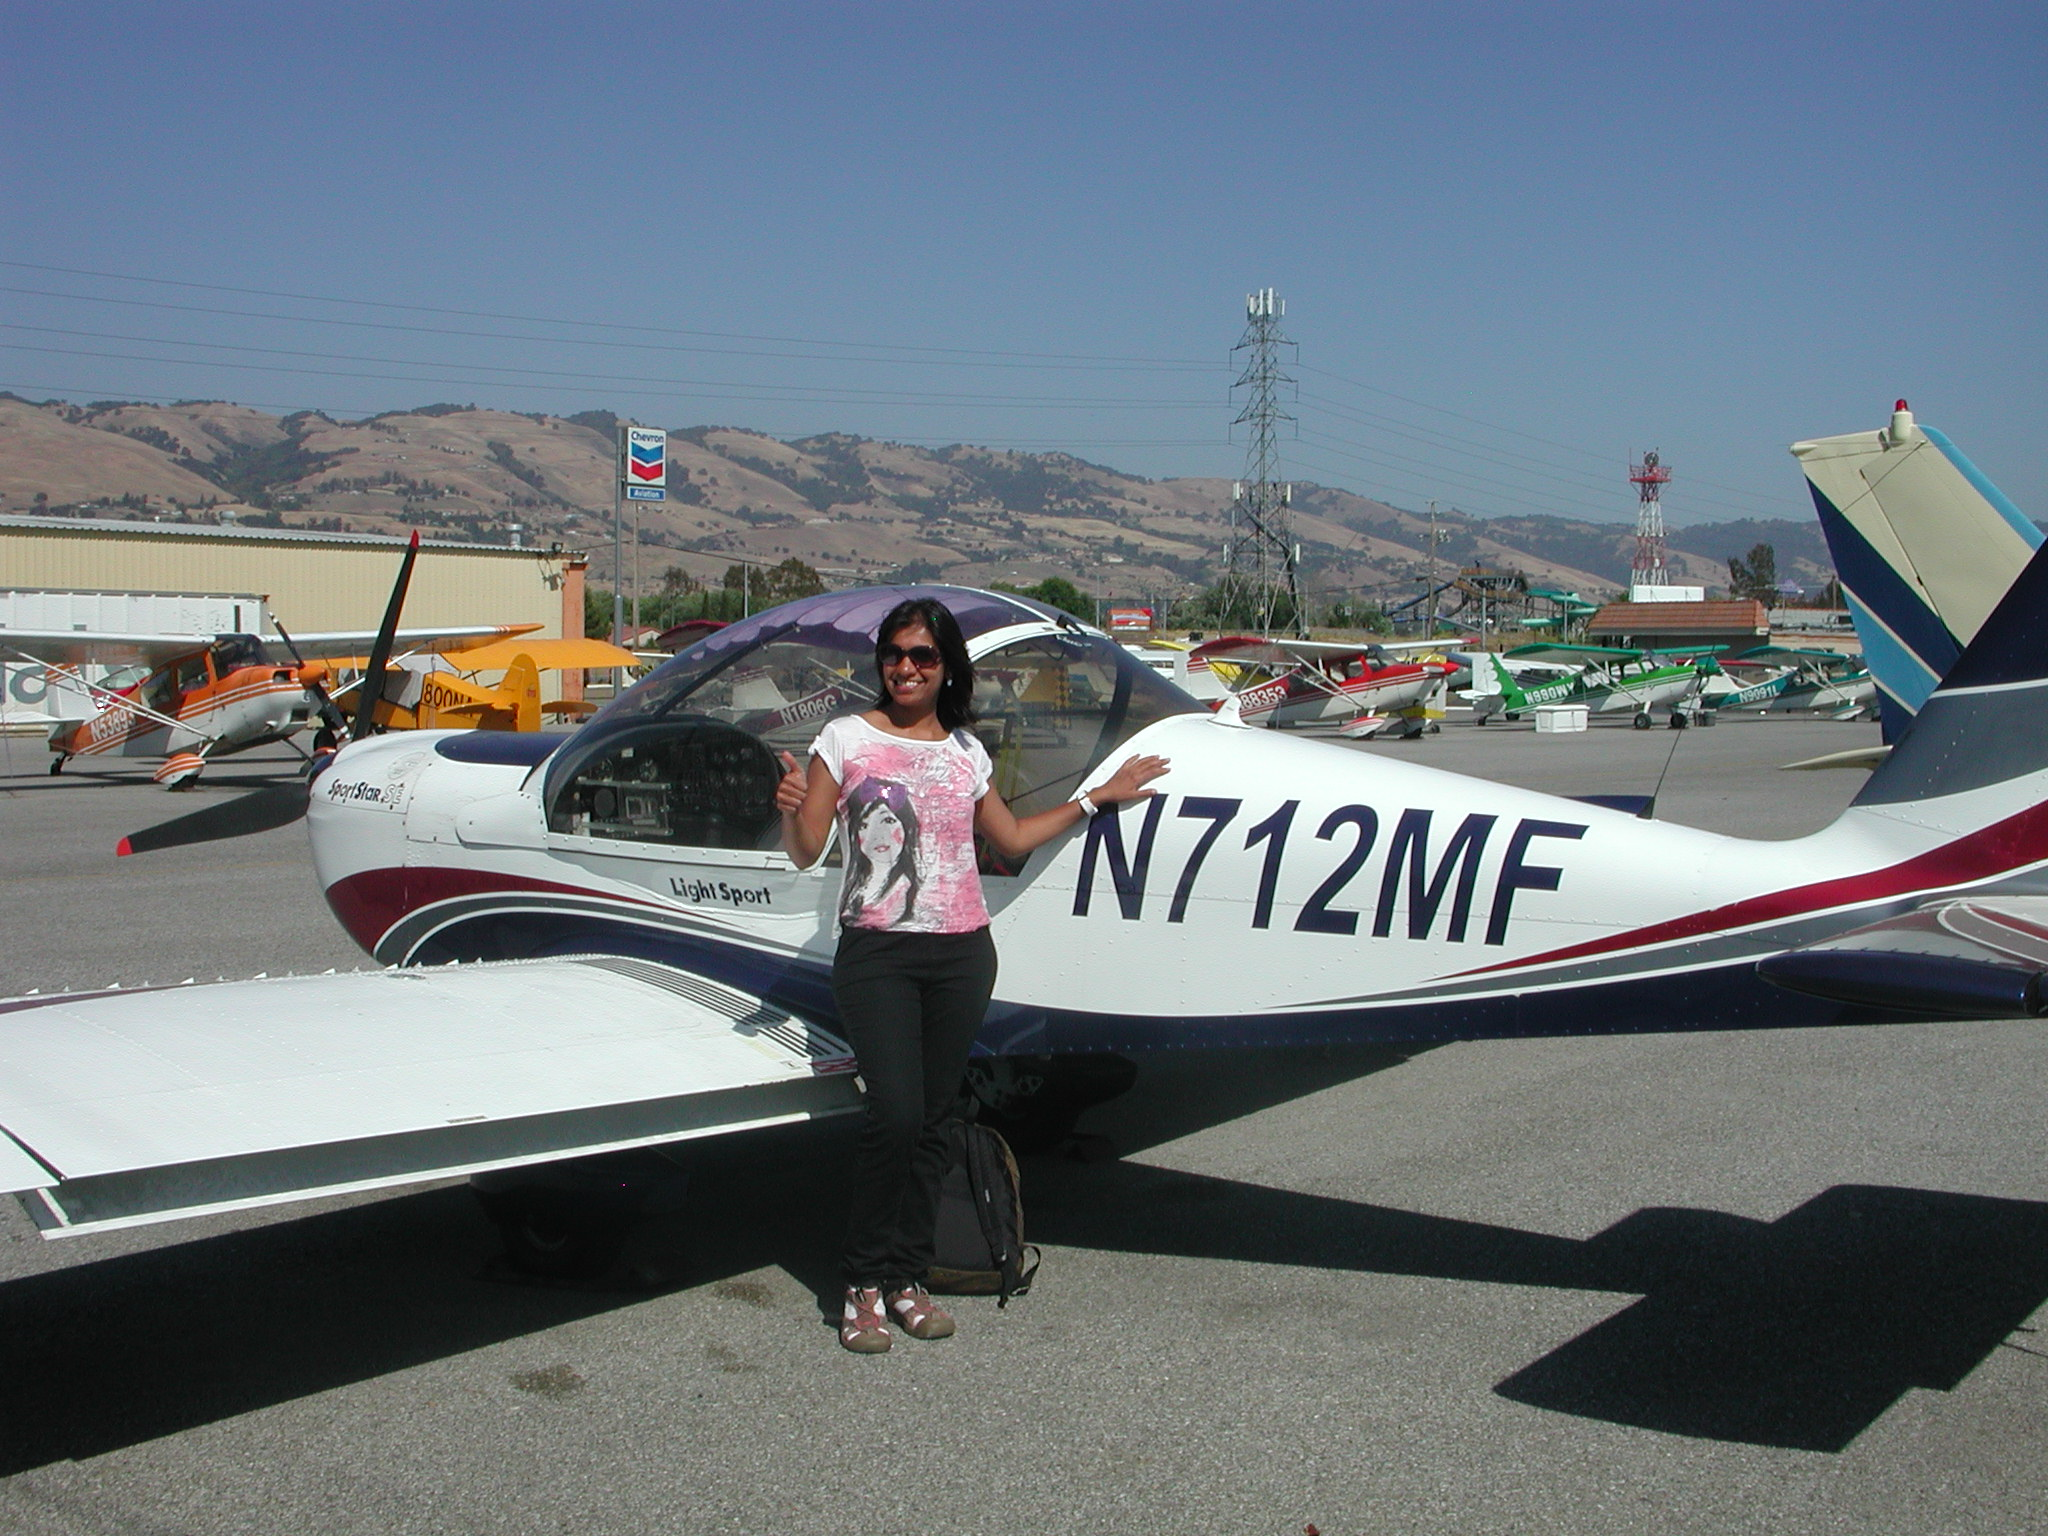 Gargi Shah flies light sport aircraft at AeroDynamic Aviation at Reid Hillview Airport located in San Jose, CA.